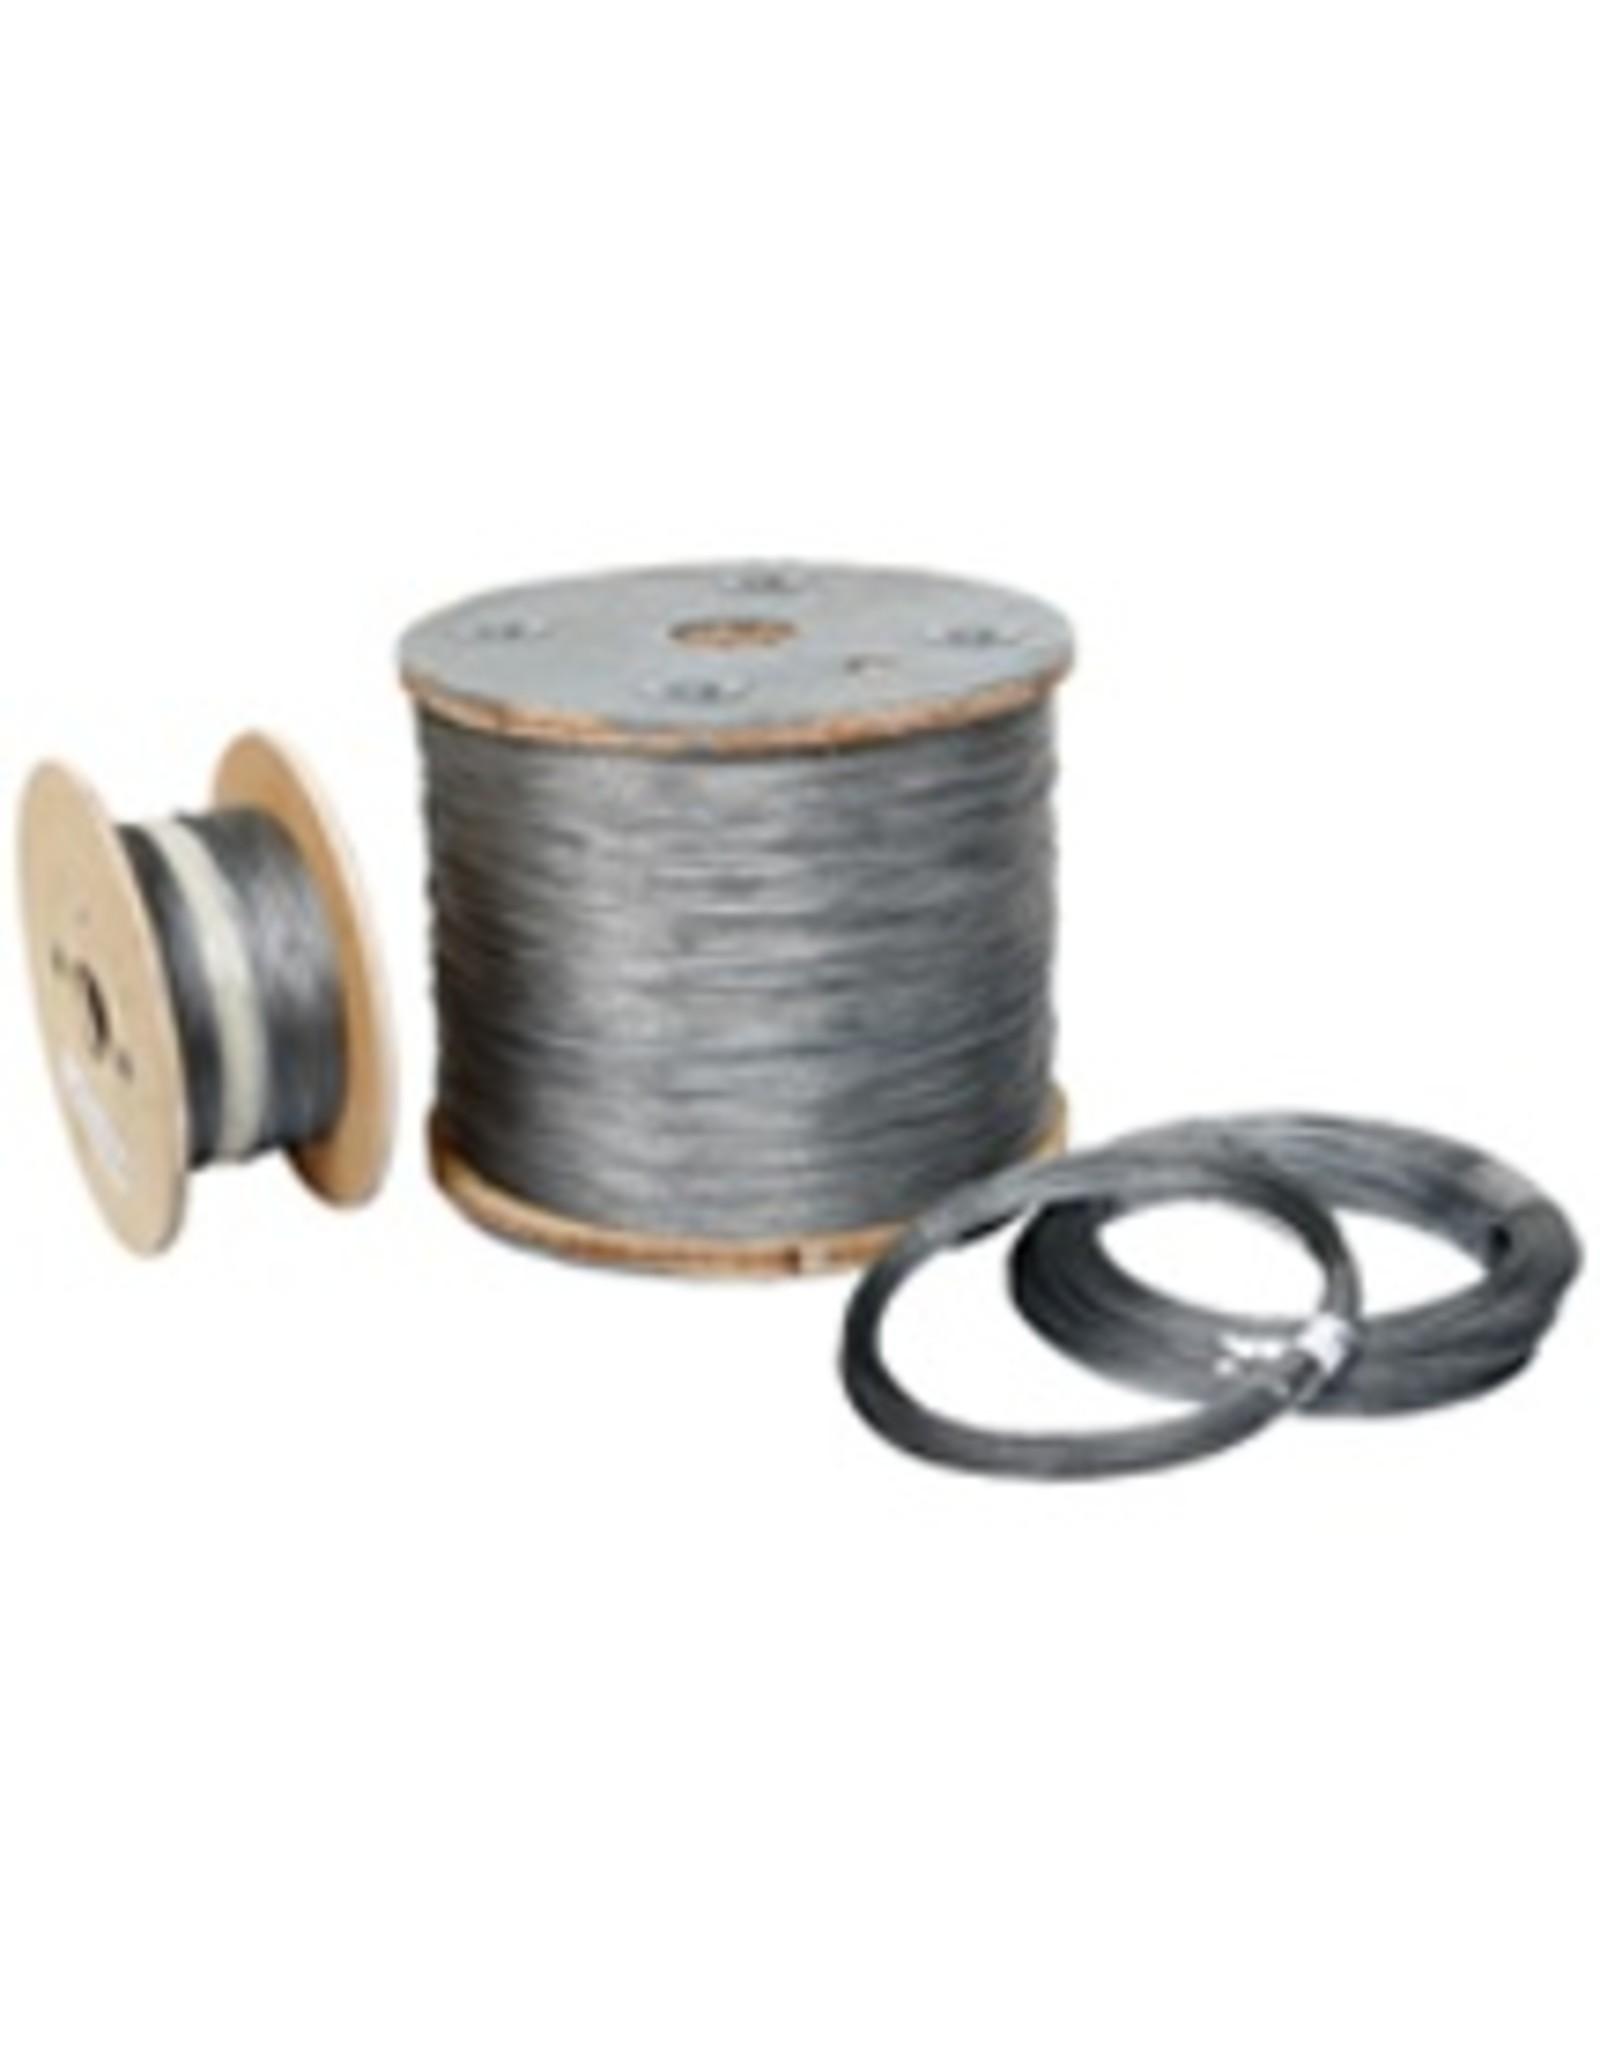 "Snare Cable 3/32"" 7 X 7 Strand per foot"